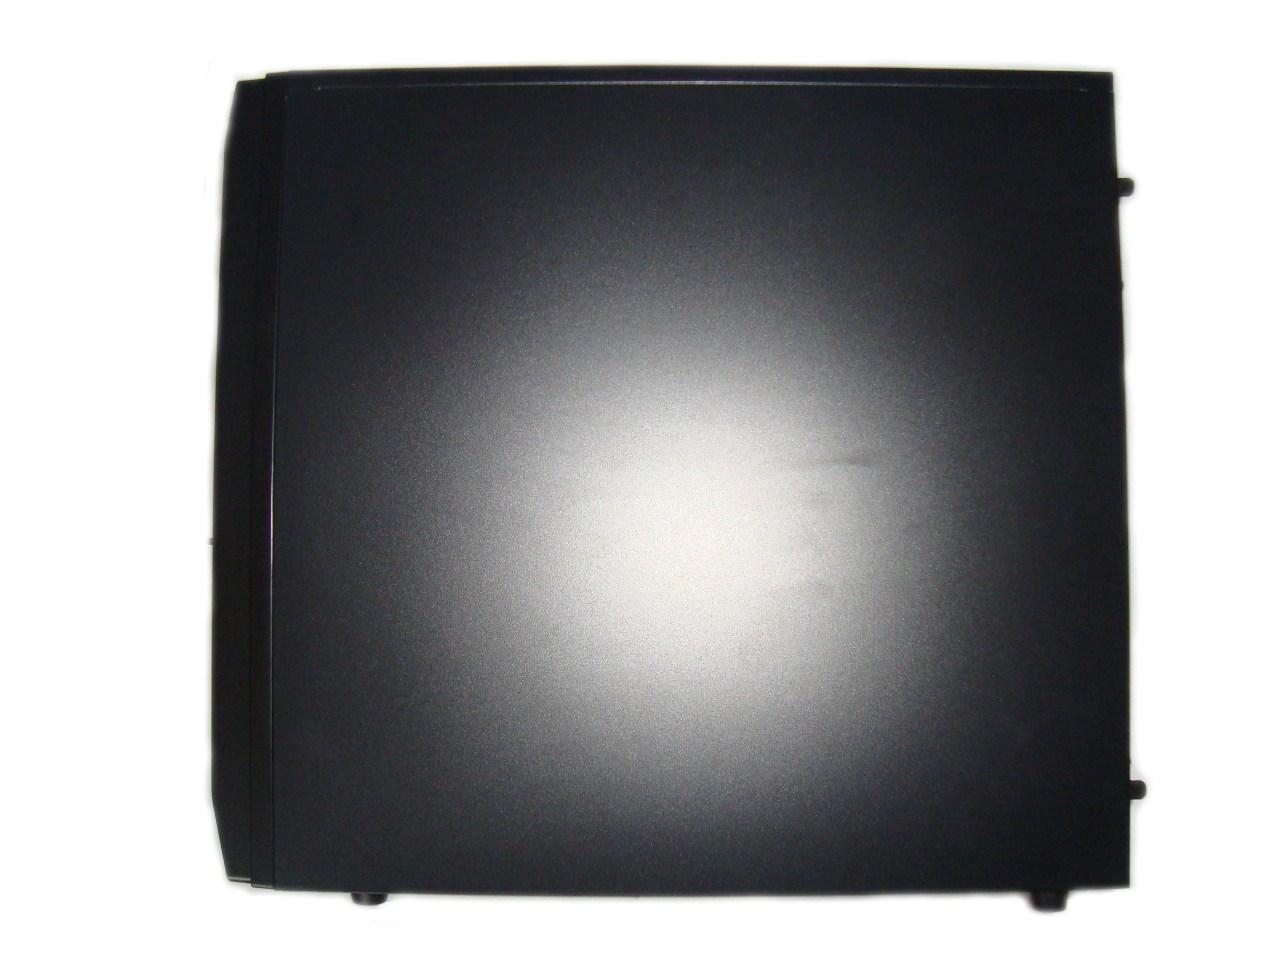 Chieftec LIBRA LF-02B - Prawy panel